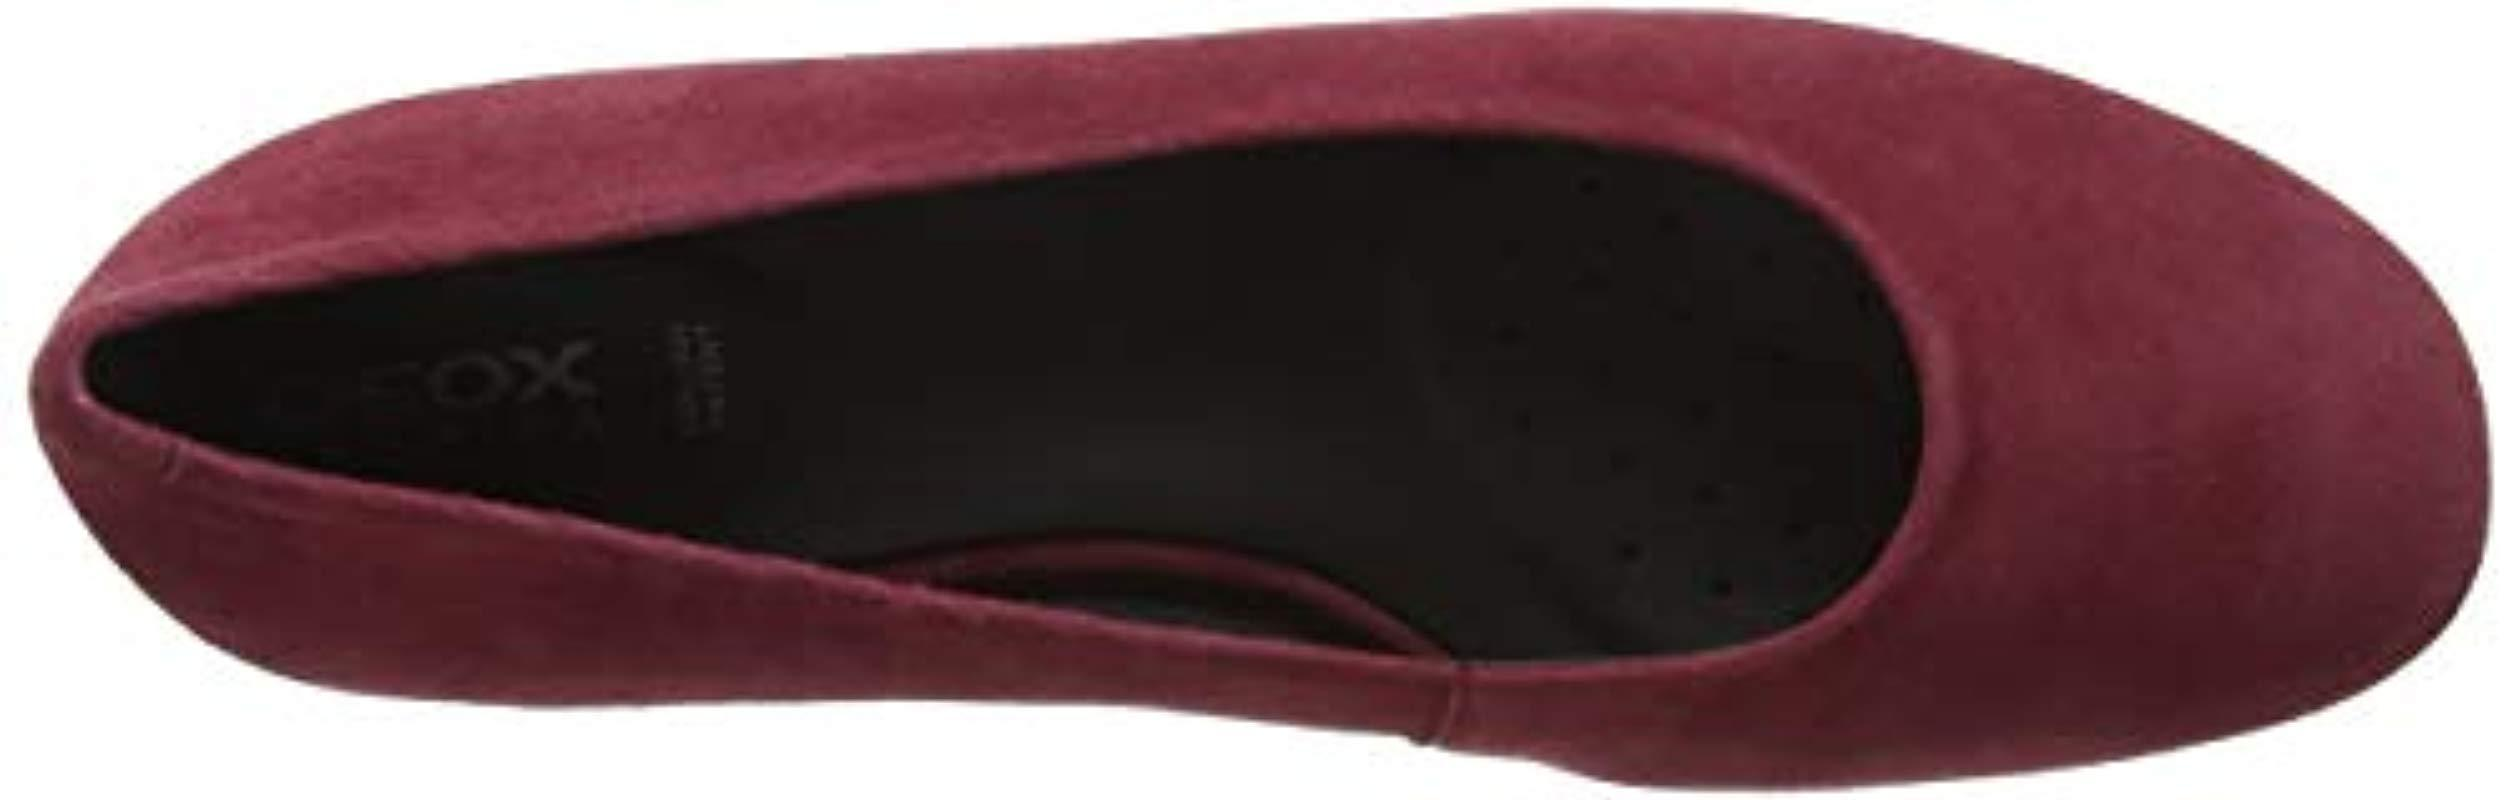 D Chloo Mid B, Zapatos de Tacón para Mujer Geox